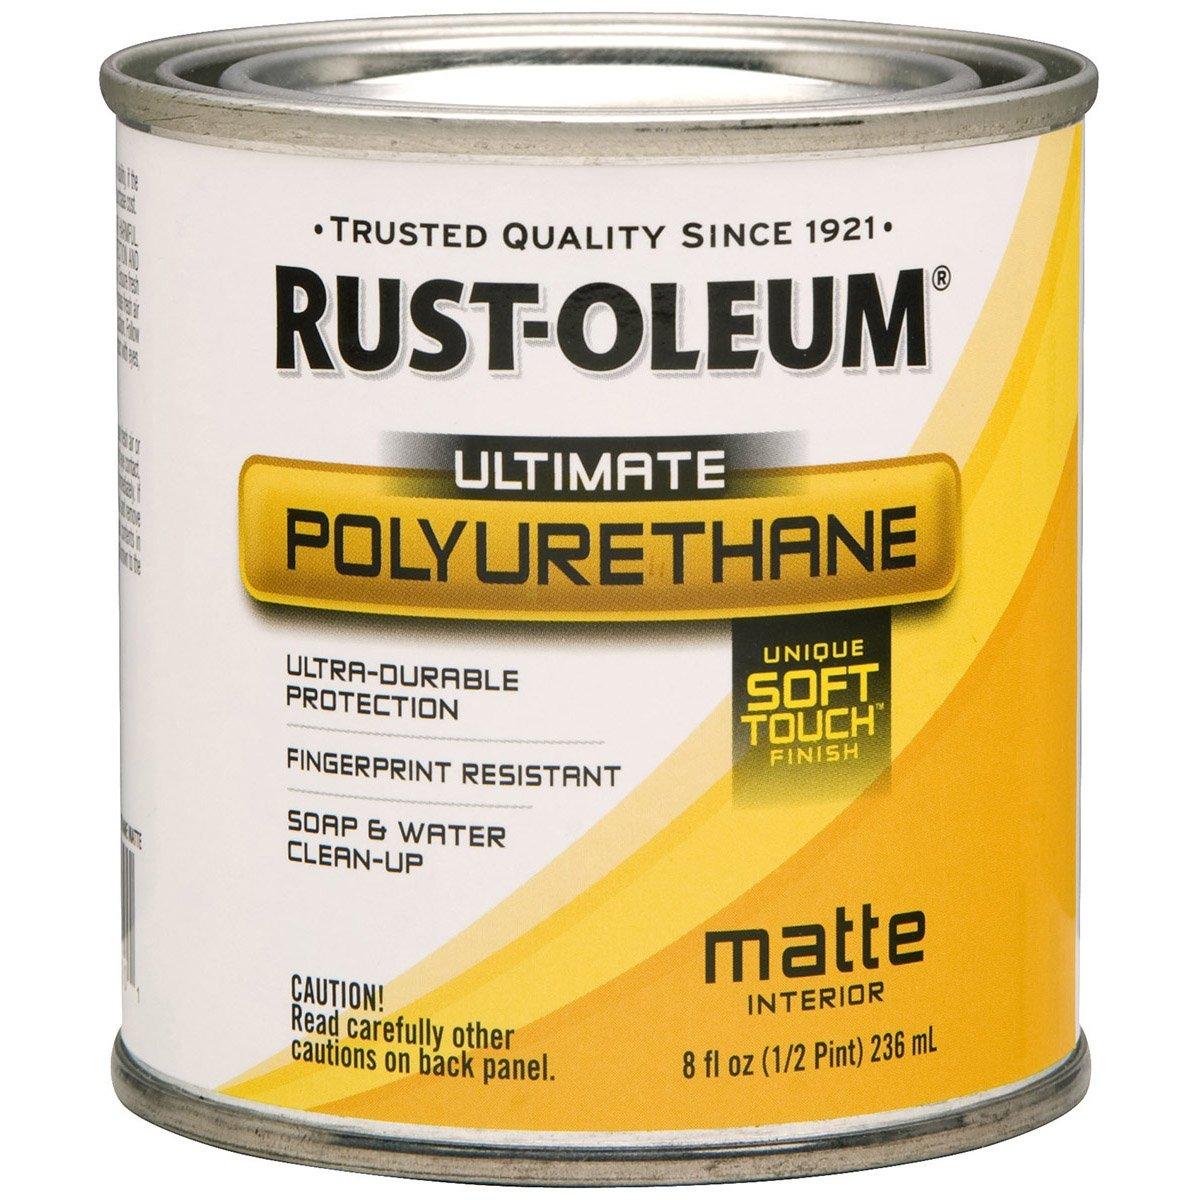 Rust-Oleum 260357 Soft Touch Polyurethane, Half Pint, Matte